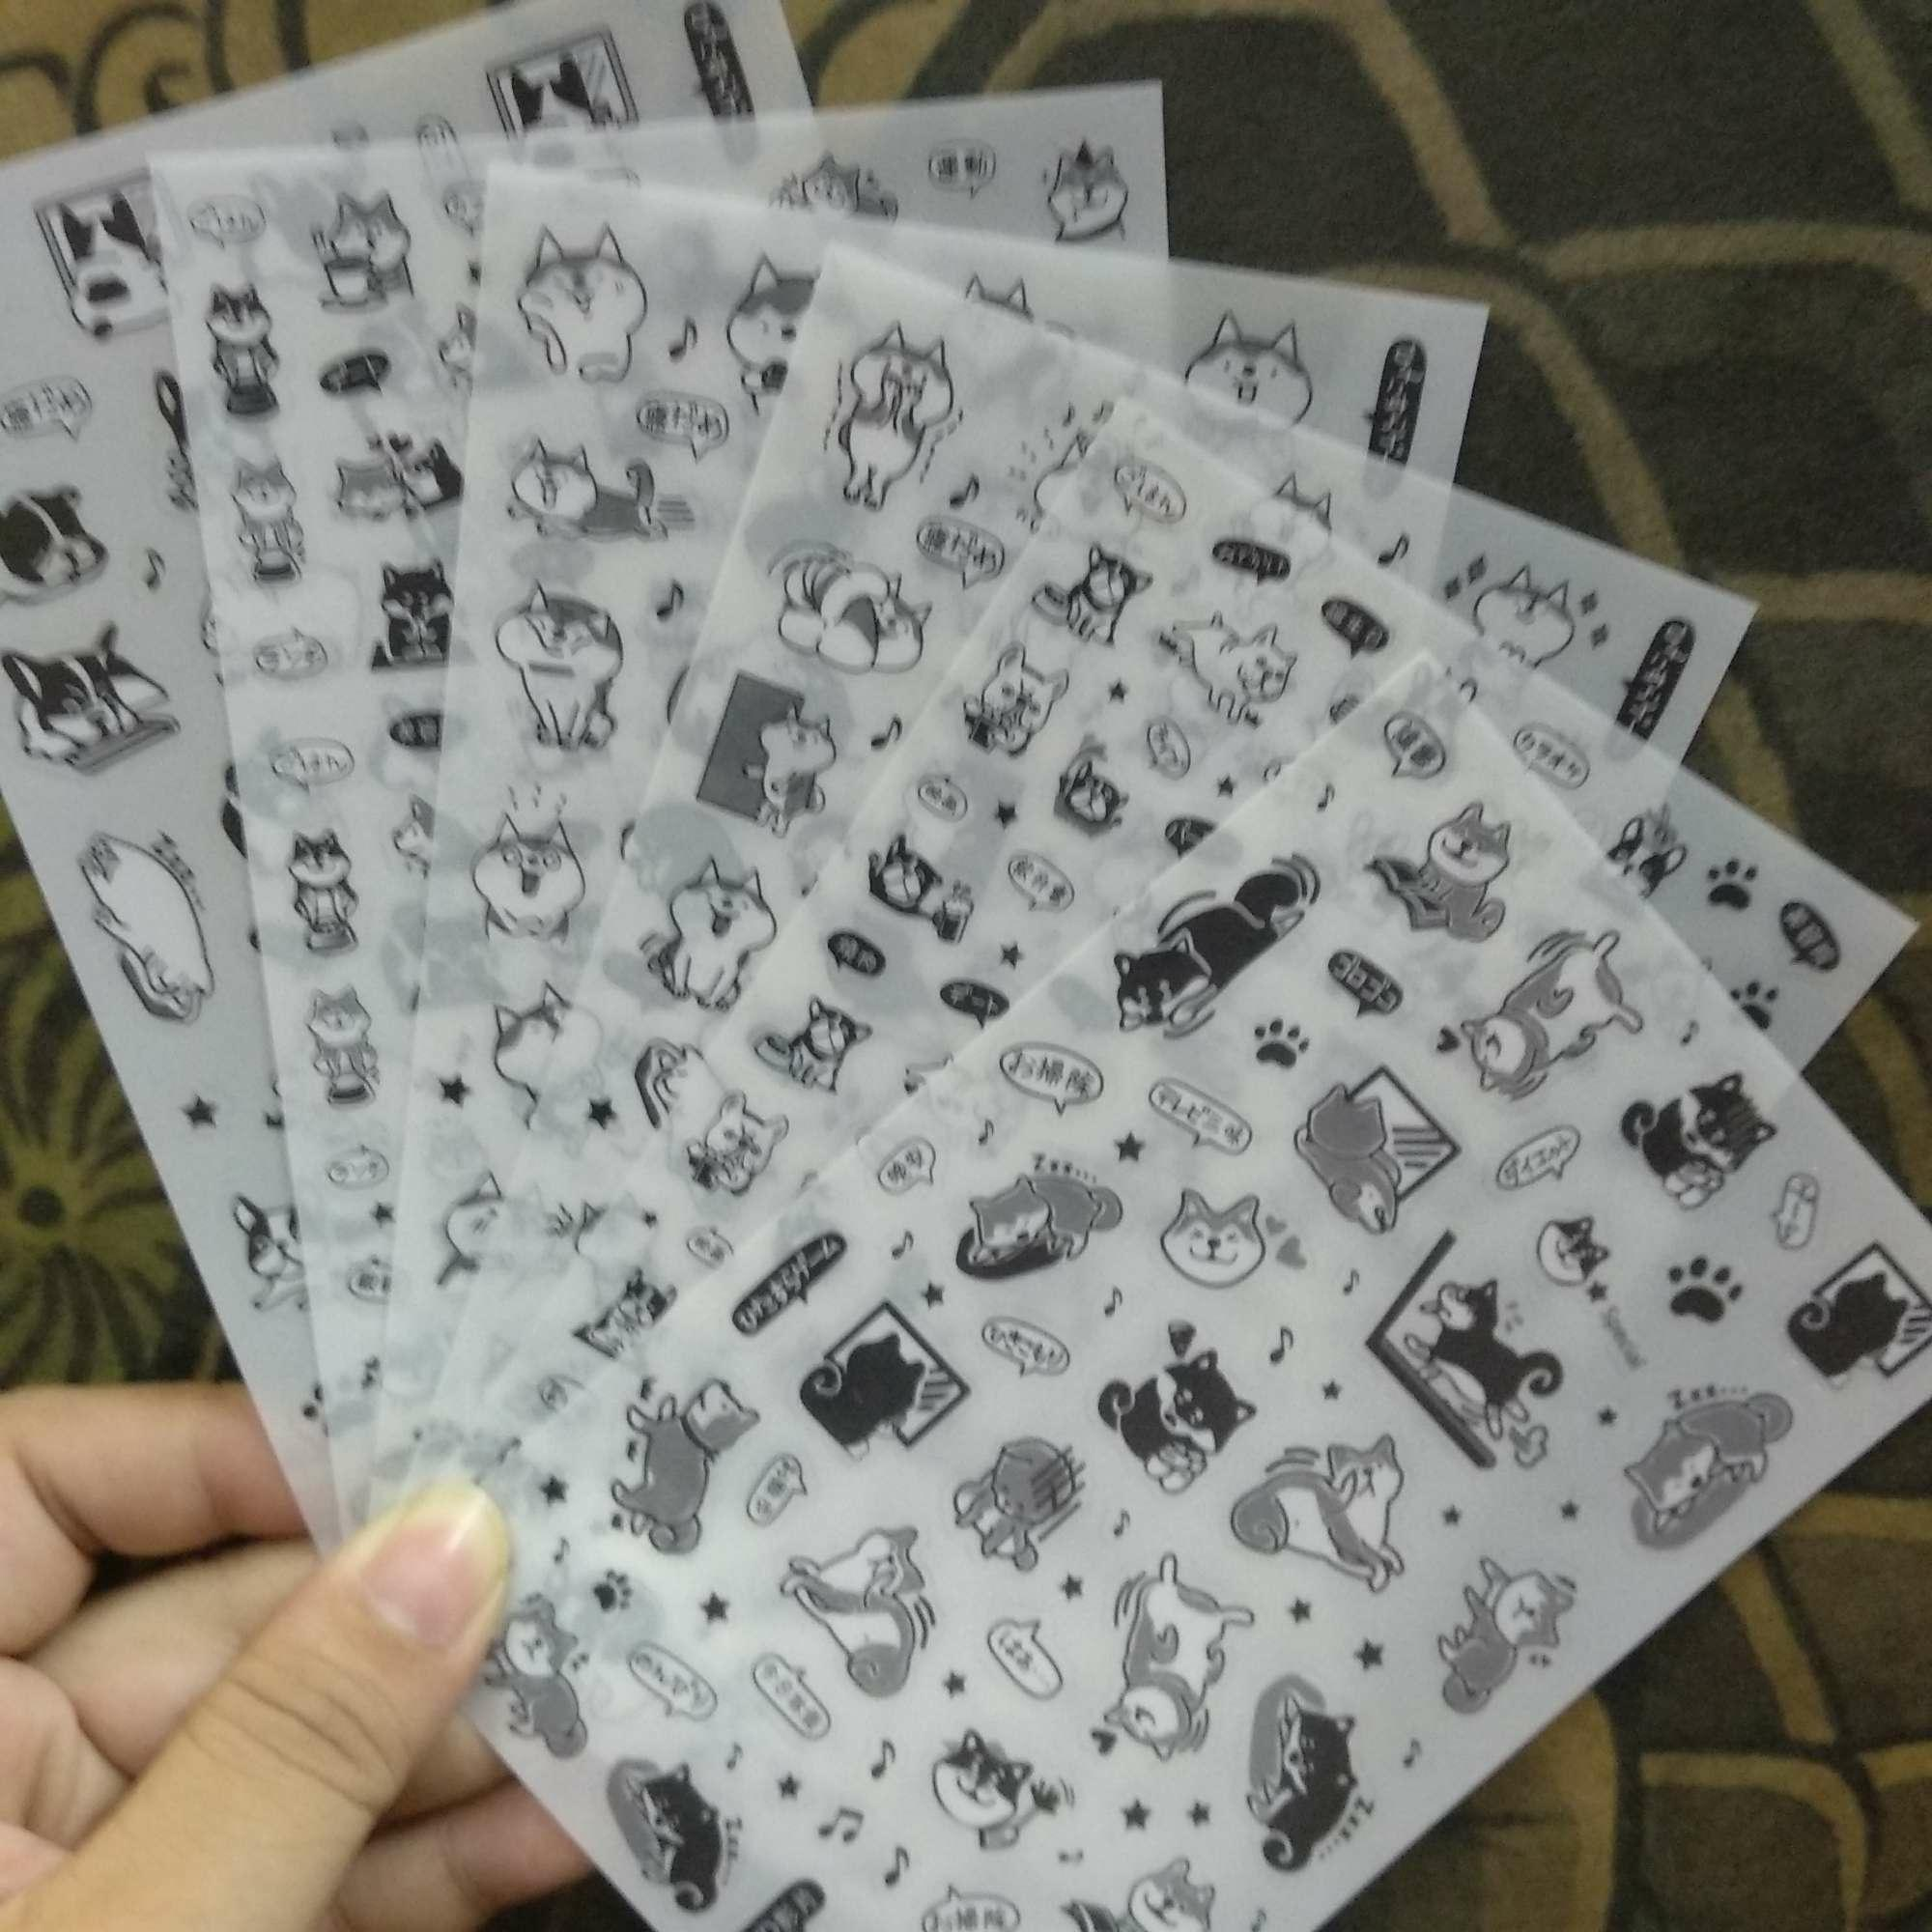 Mua Bộ 6 tấm hình dán sticker